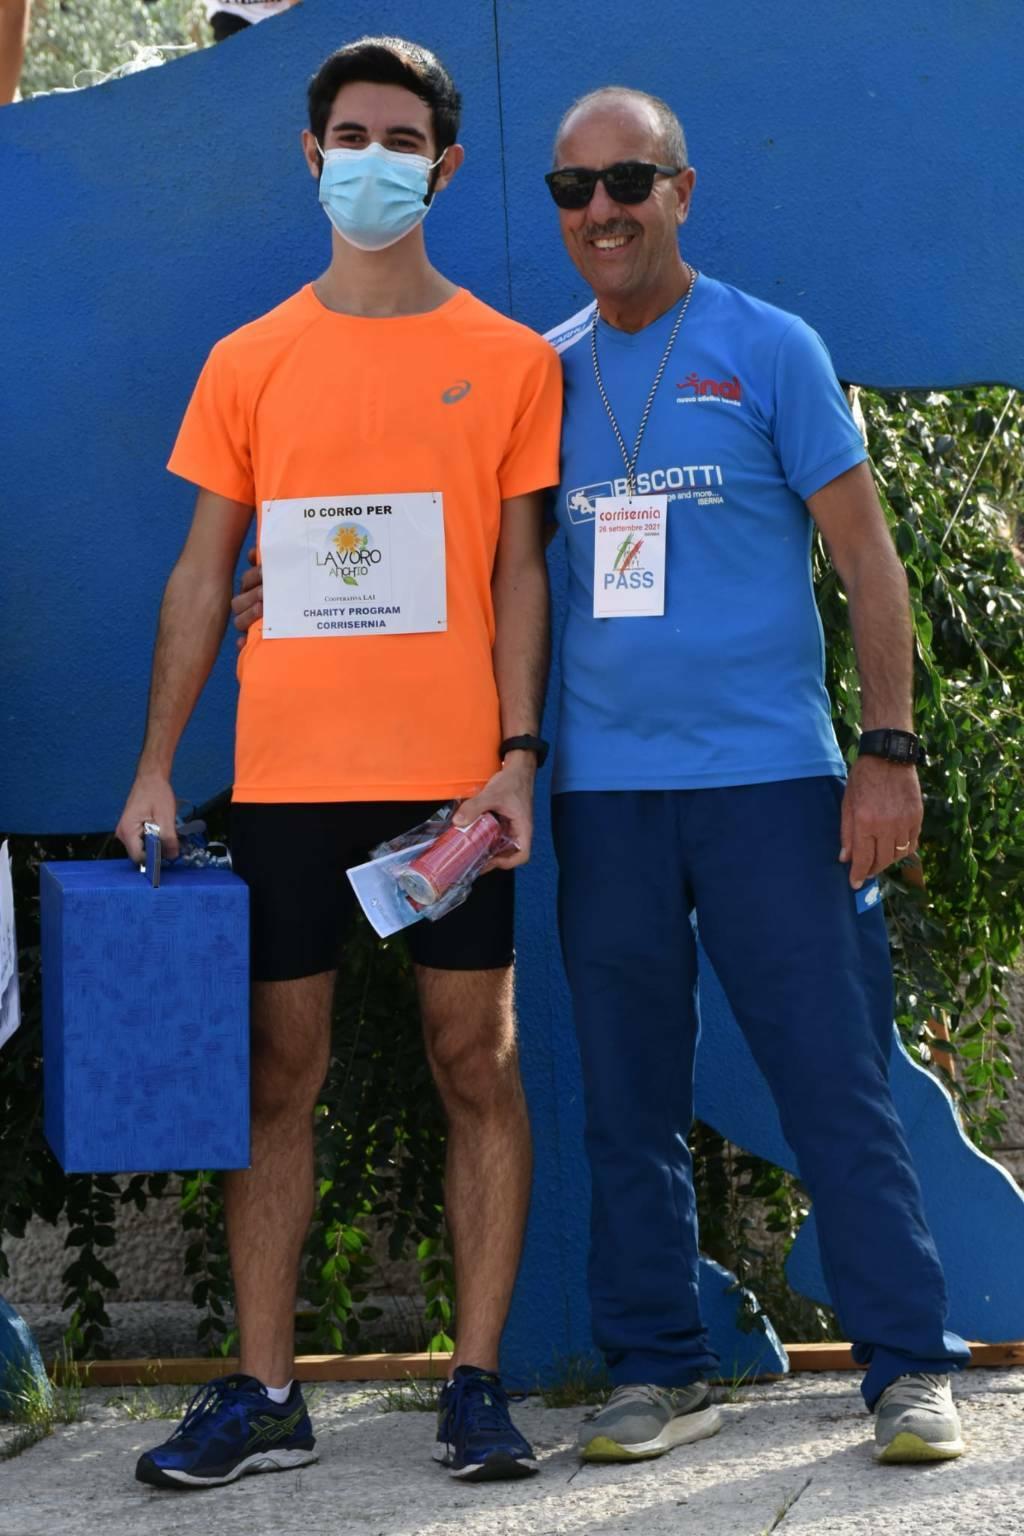 Atleti runners Termoli